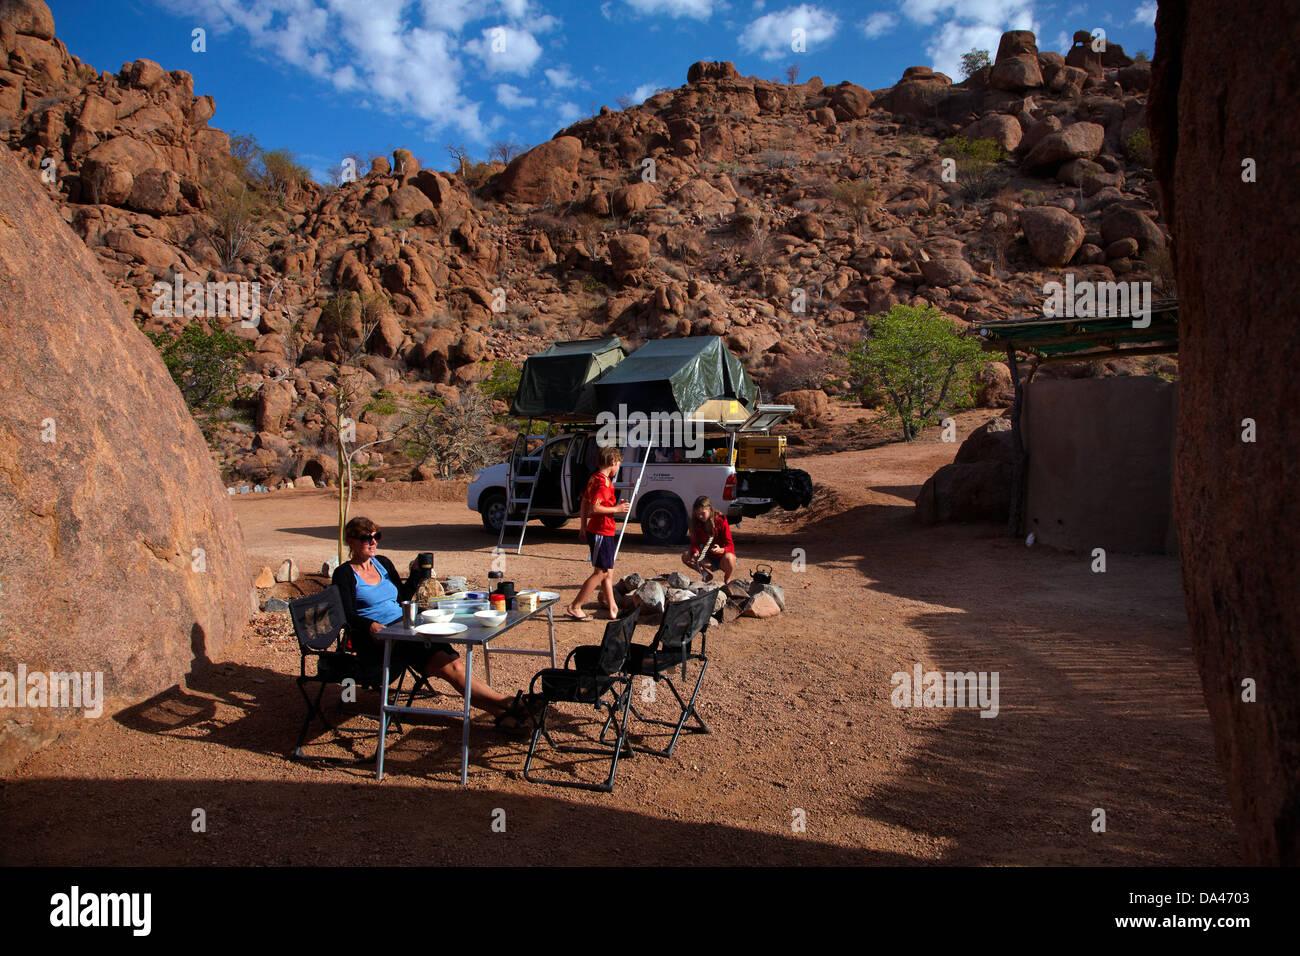 Family camping at Mowani Mountain Camp, near Twyfelfontein, Damaraland, Namibia, Africa Stock Photo